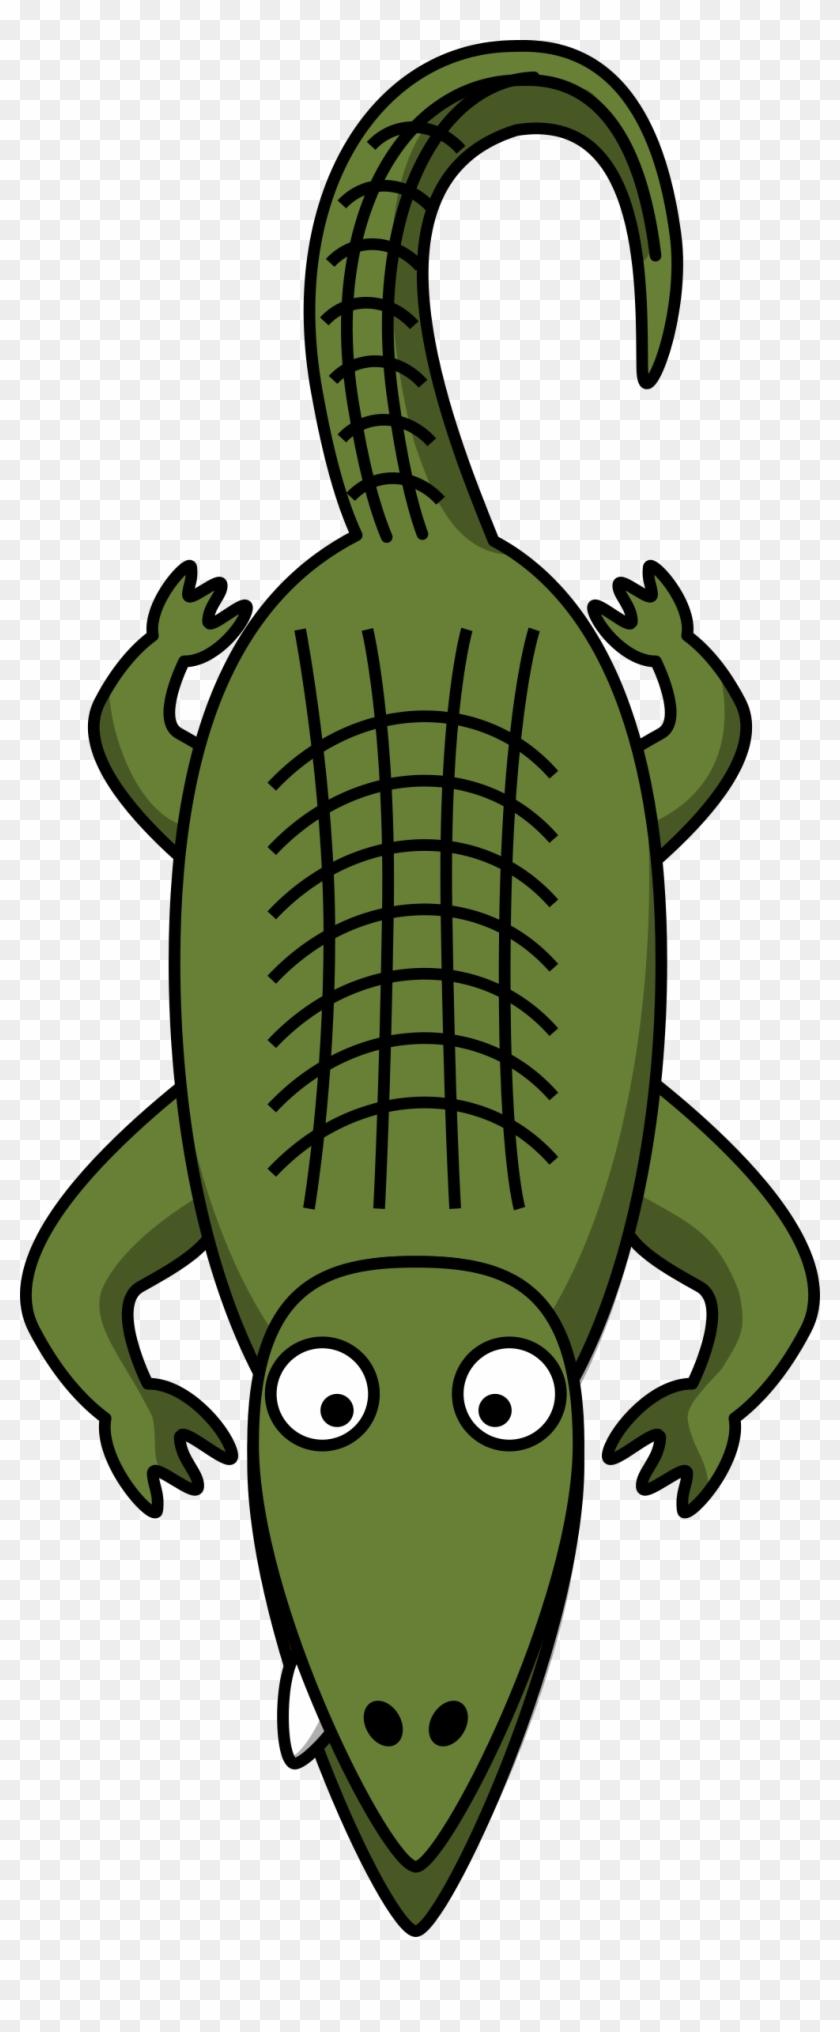 Banner Library Library Alligator Clipart - Alligator Clip Art - Png Download #985861